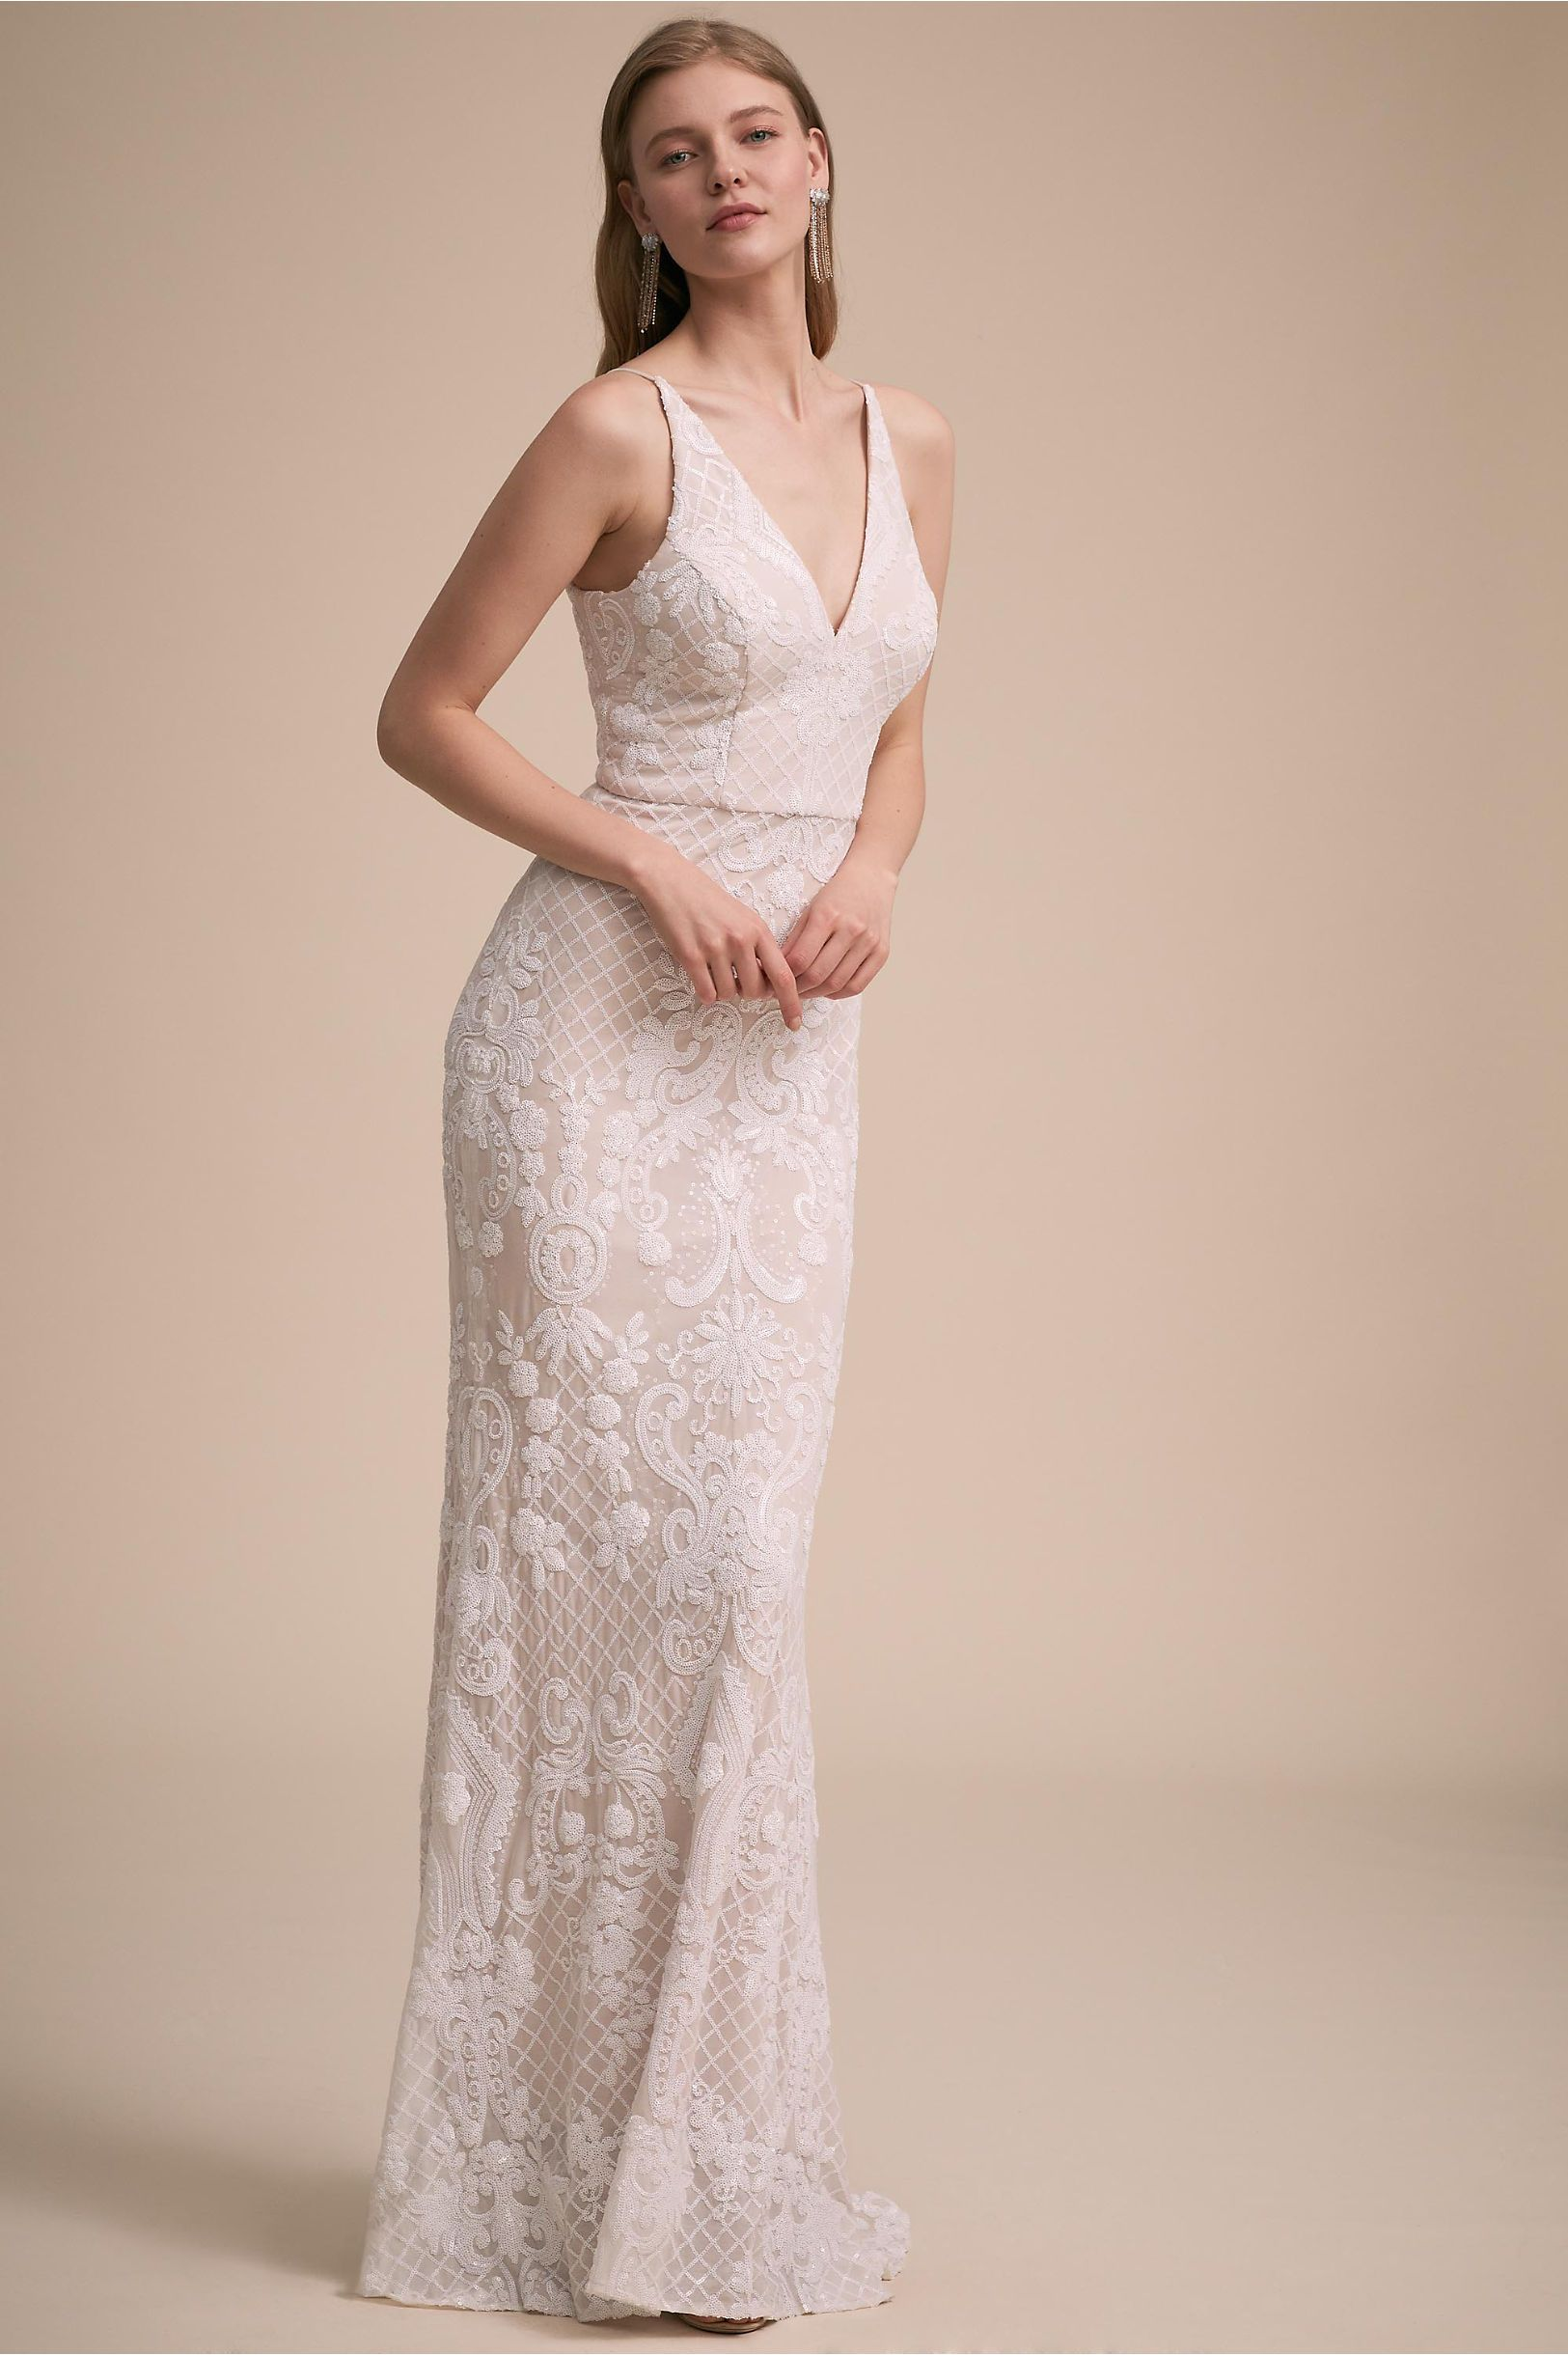 Antique cream wedding dress  BHLDNus Jennings Dress in Ivory  Products  Pinterest  Wedding